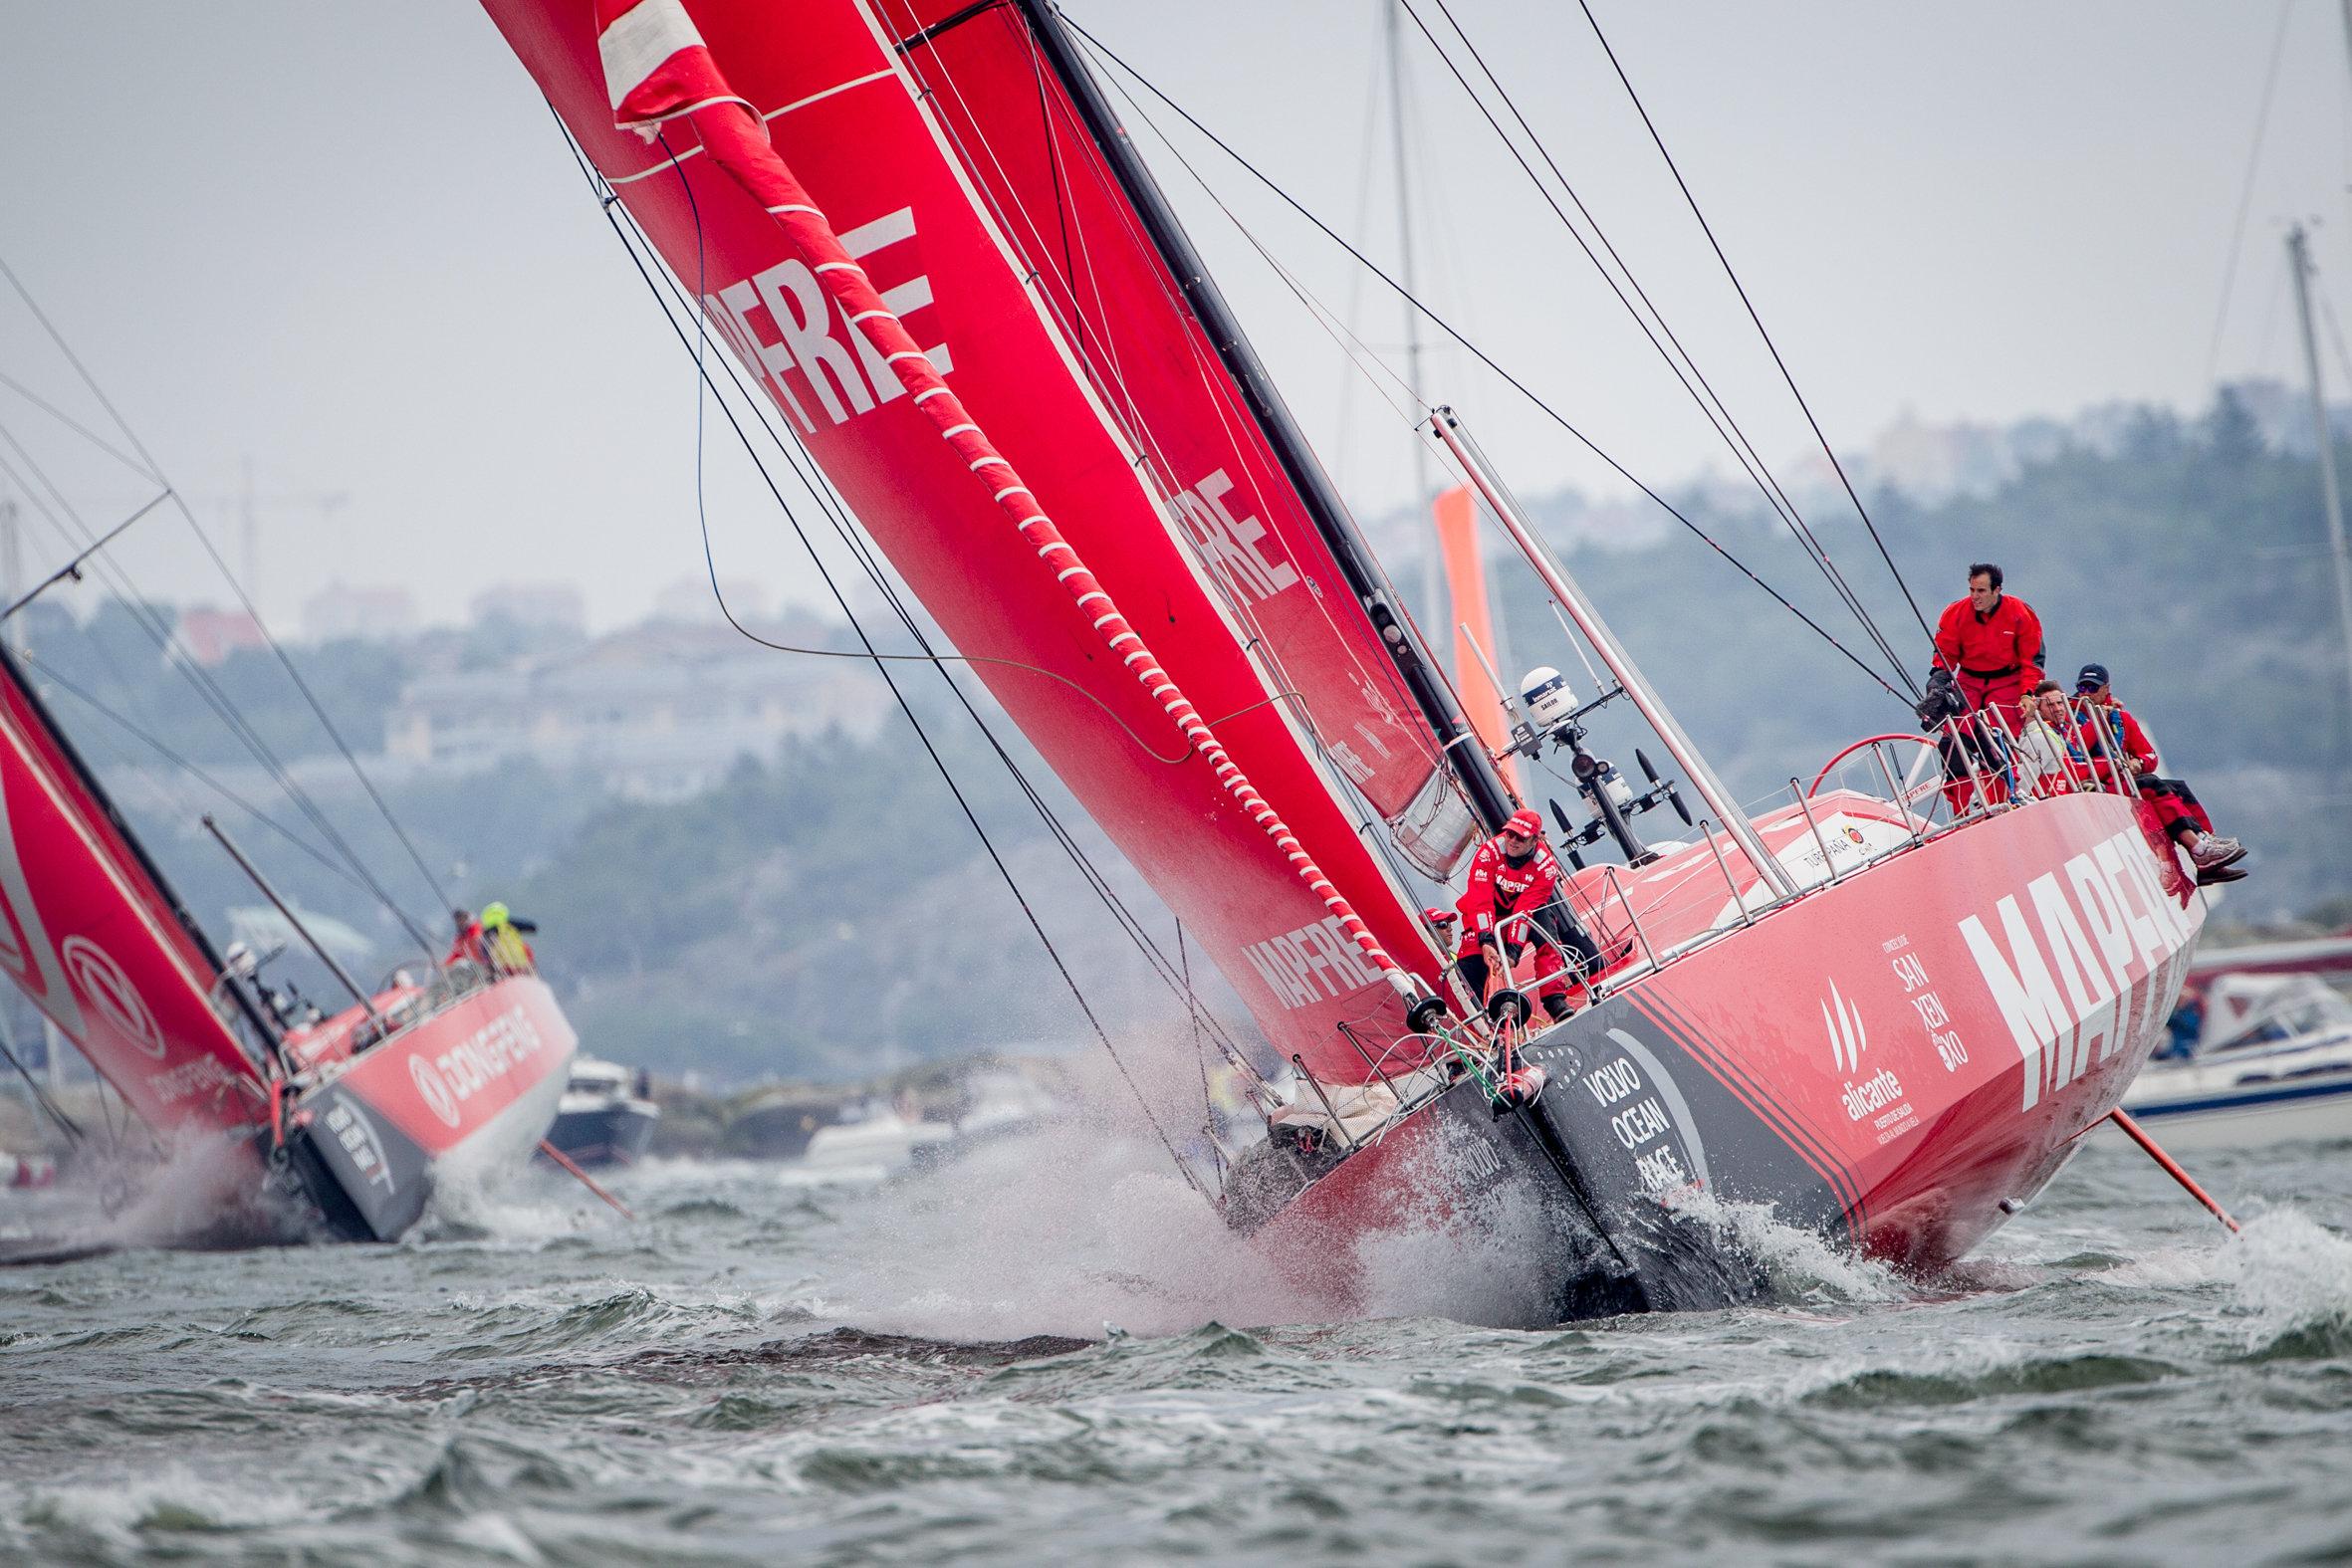 MAPFRE during the in-port race in Gothenburg. Photo © María Muiña / MAPFRE.